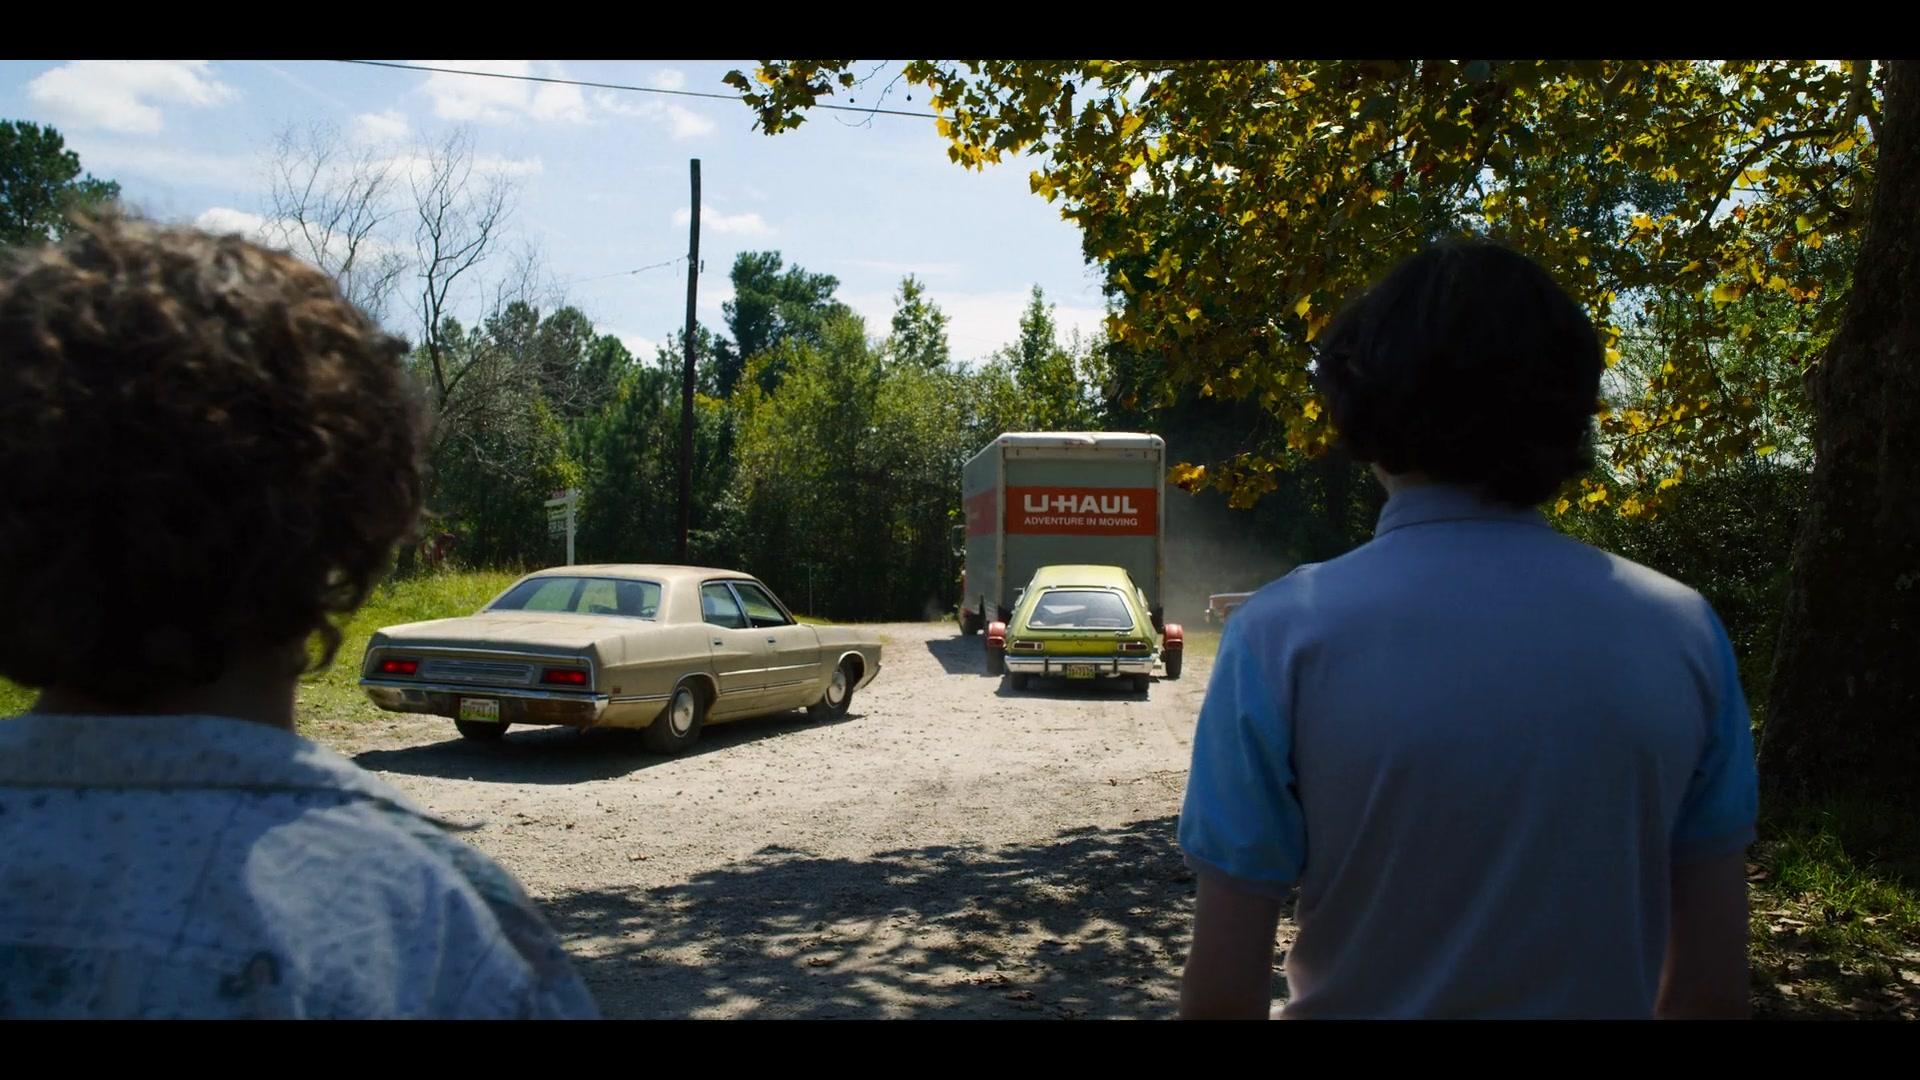 stranger things season 4 - photo #15